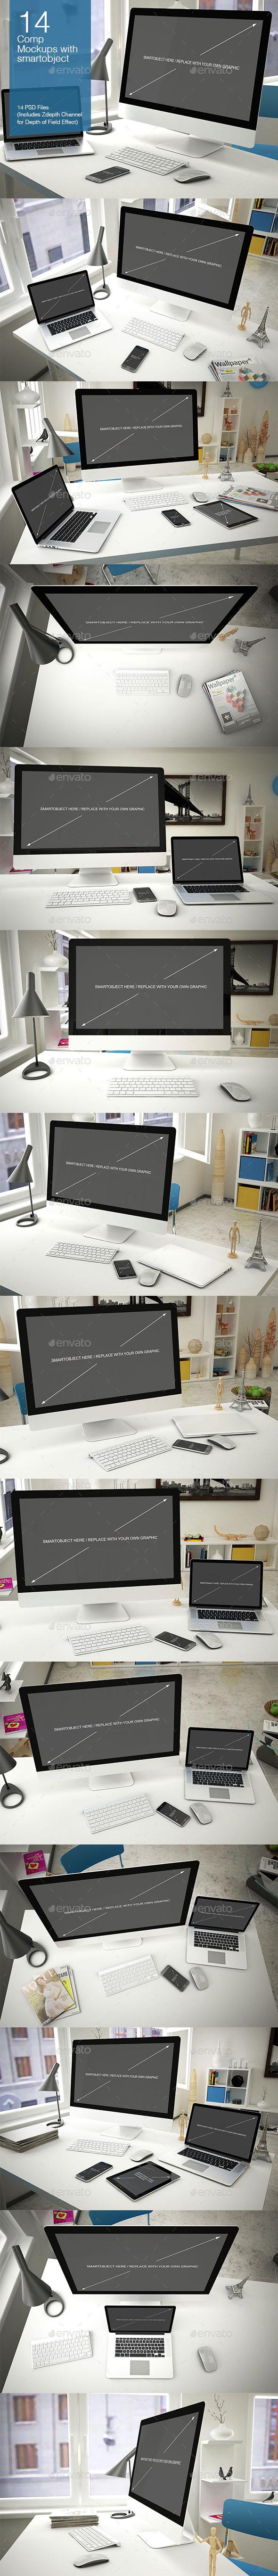 Computer Mockup 14 Poses - Multiple Displays